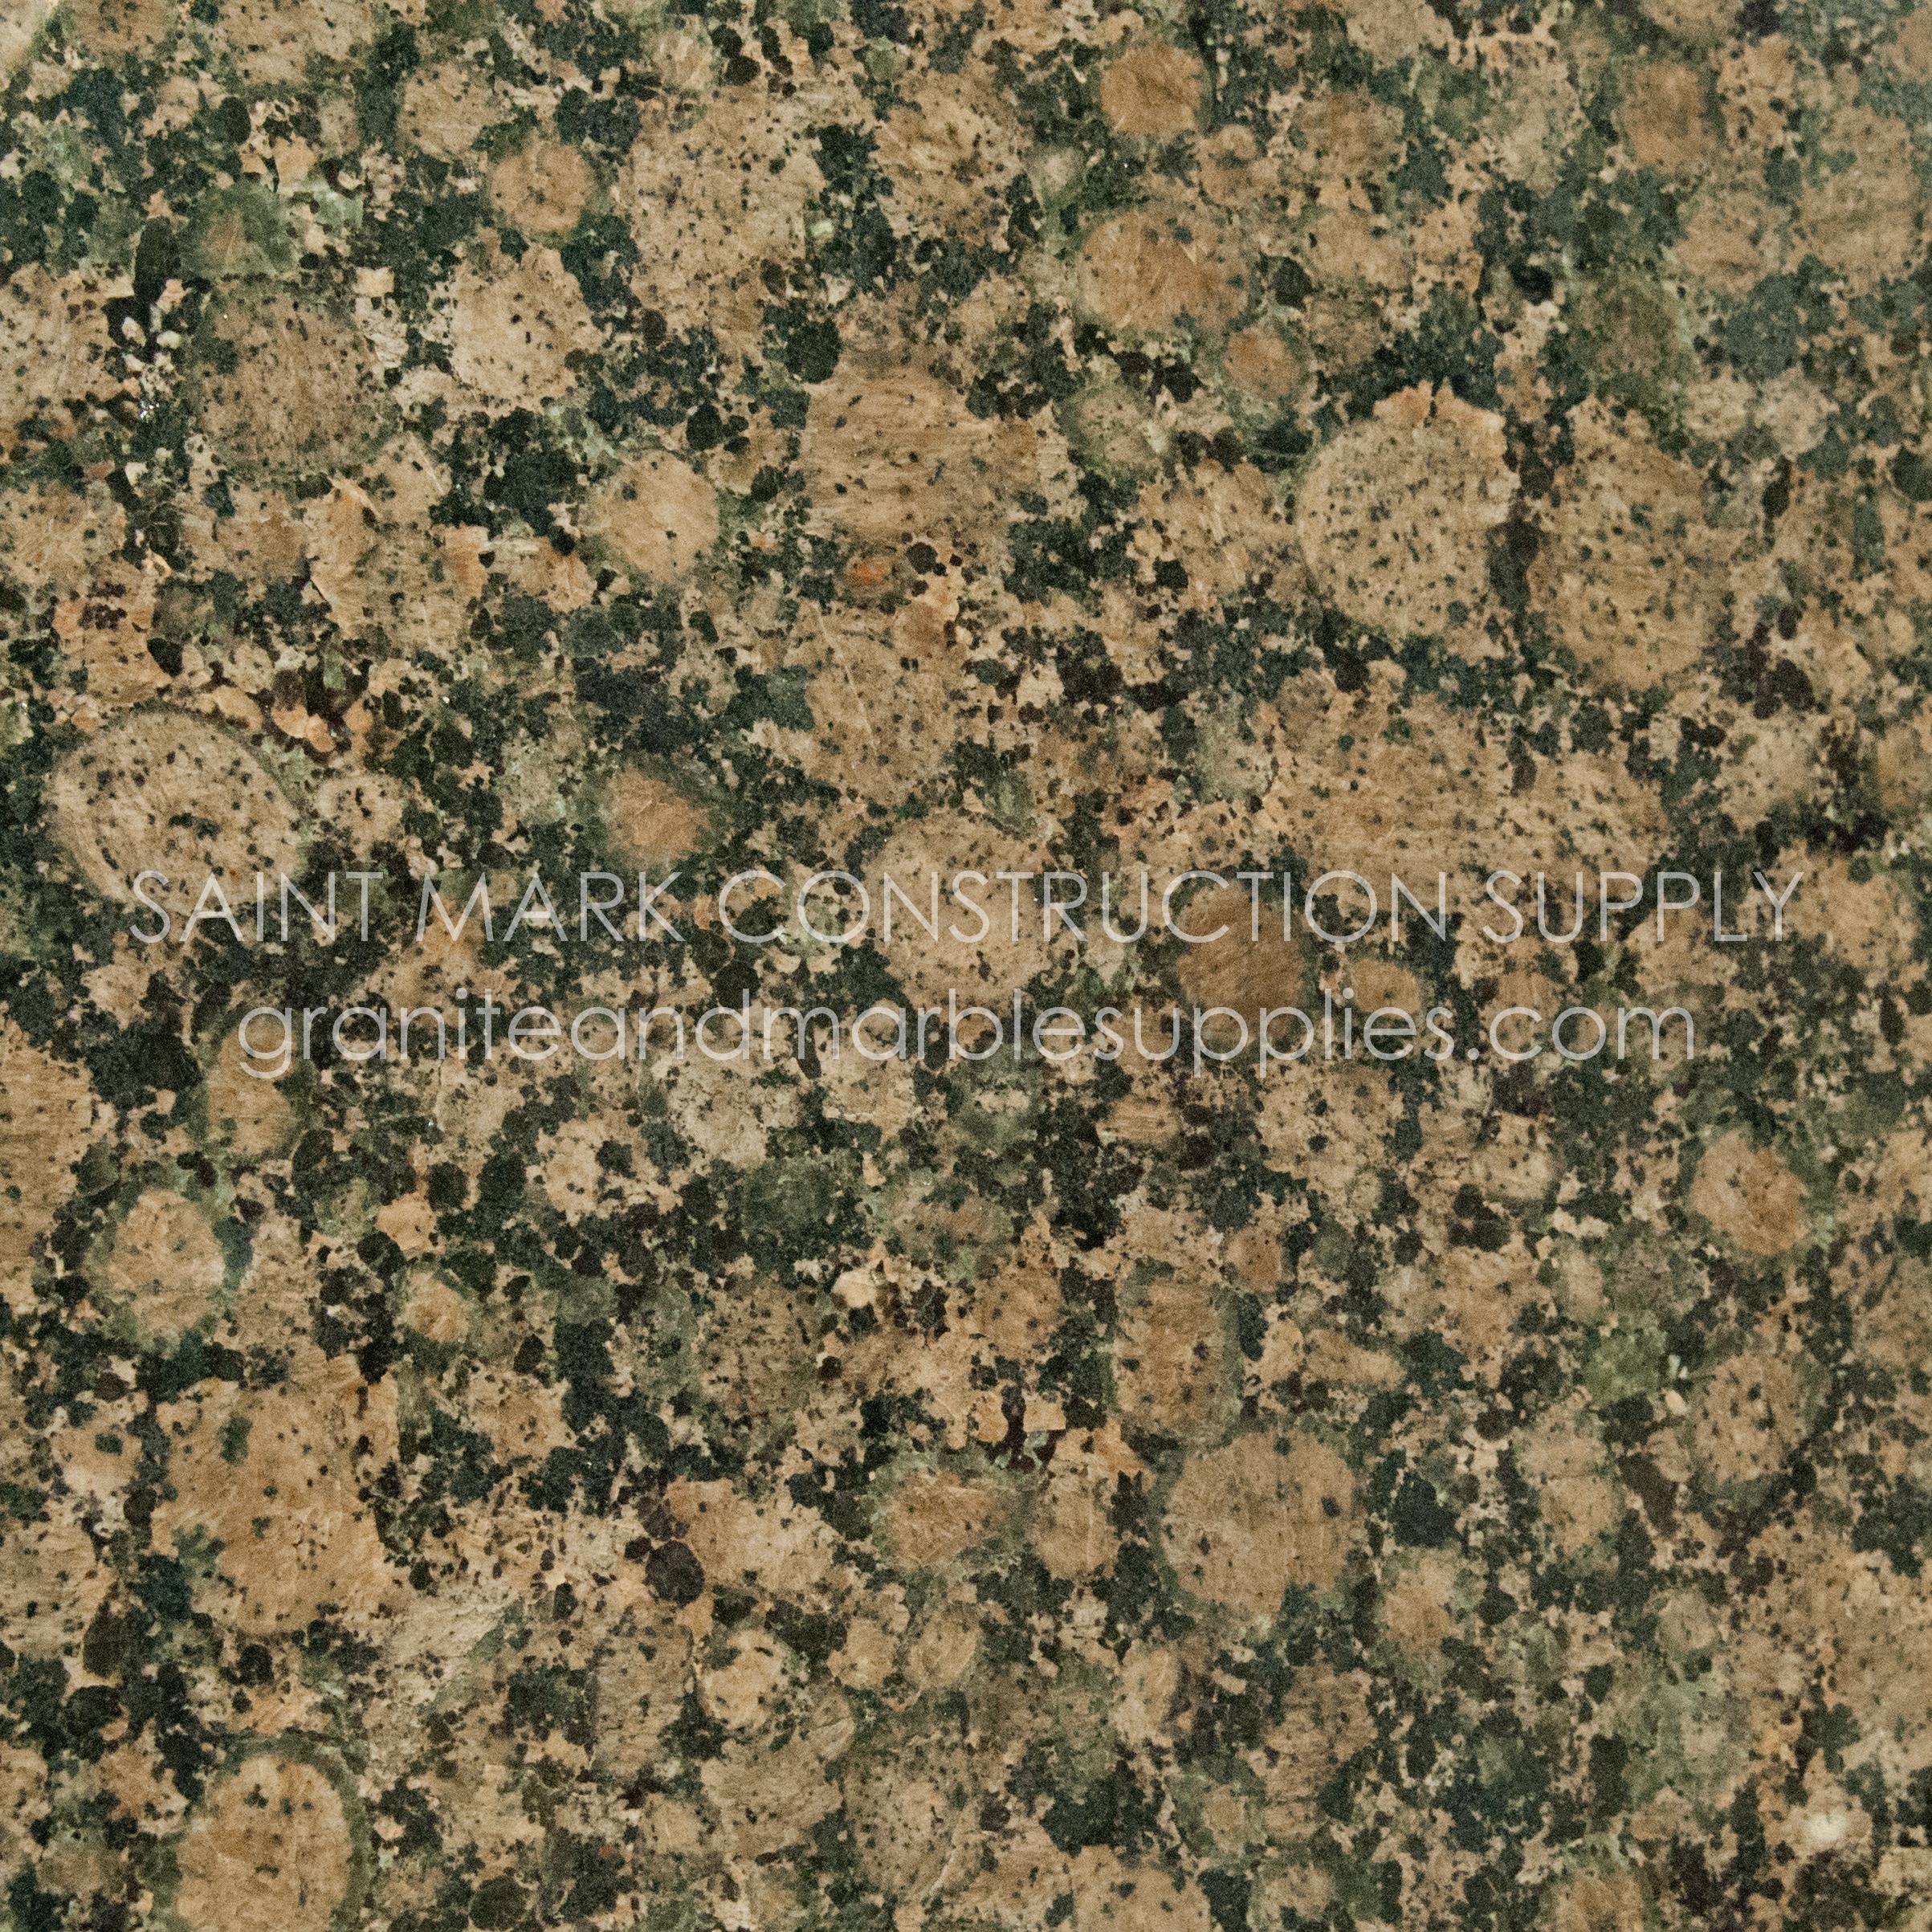 Saint Mark Construction Supply Supplier Of Granite